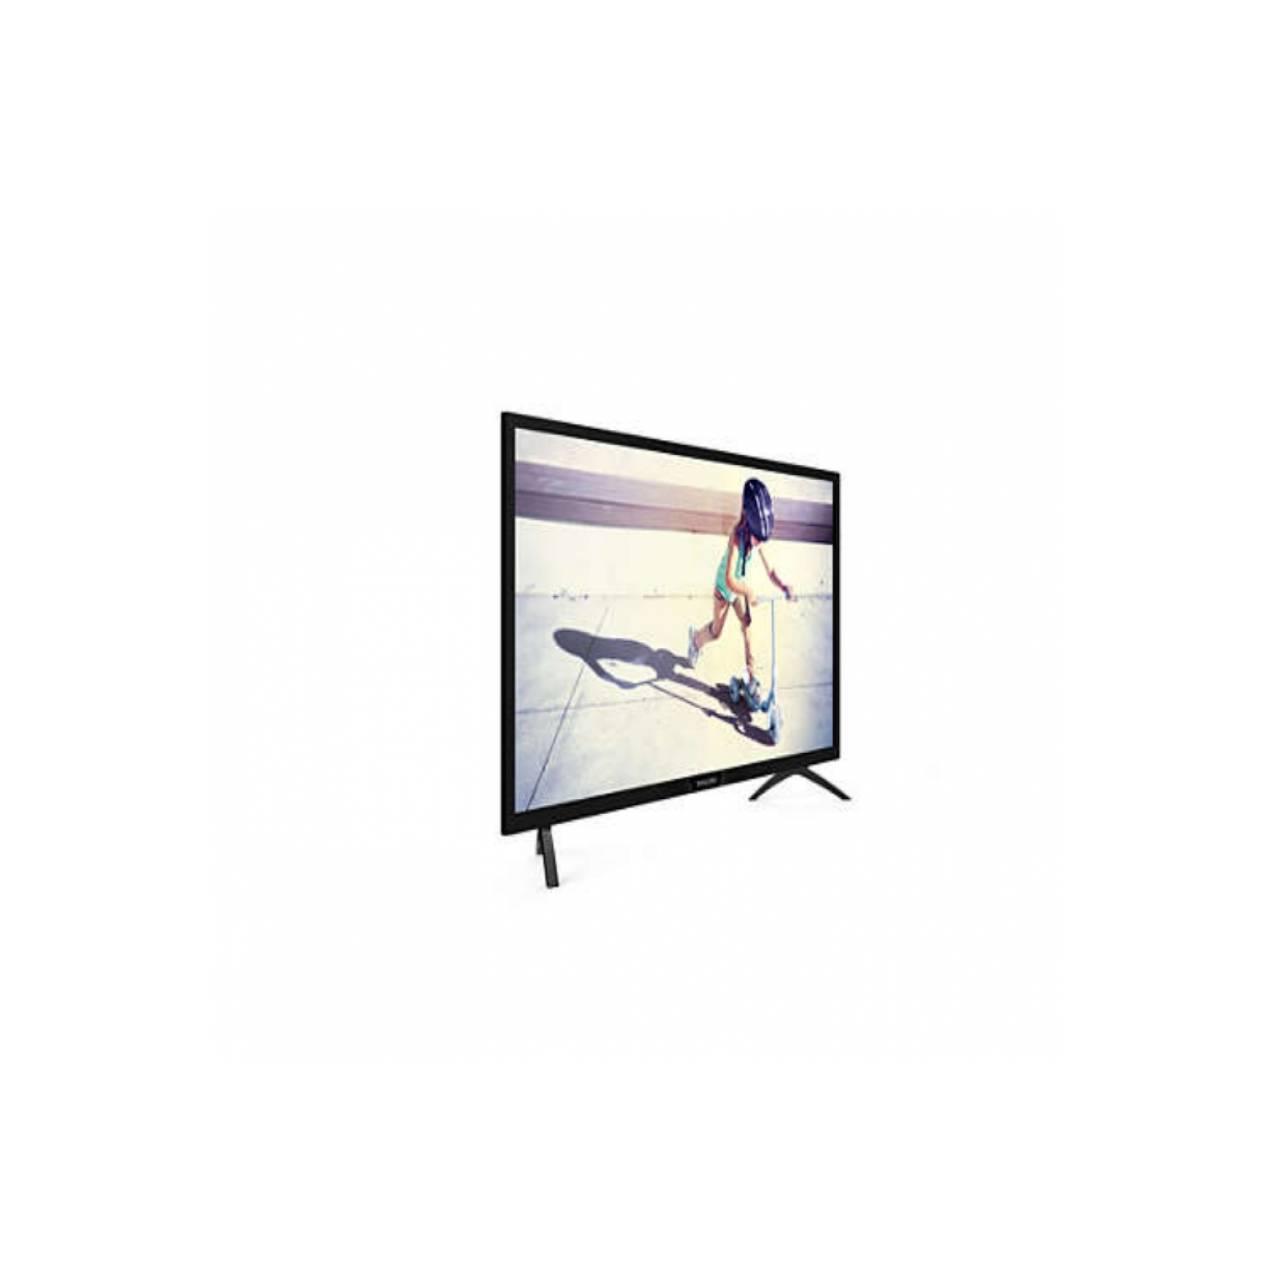 Philips LED TV 32PHT4002 32inci murah